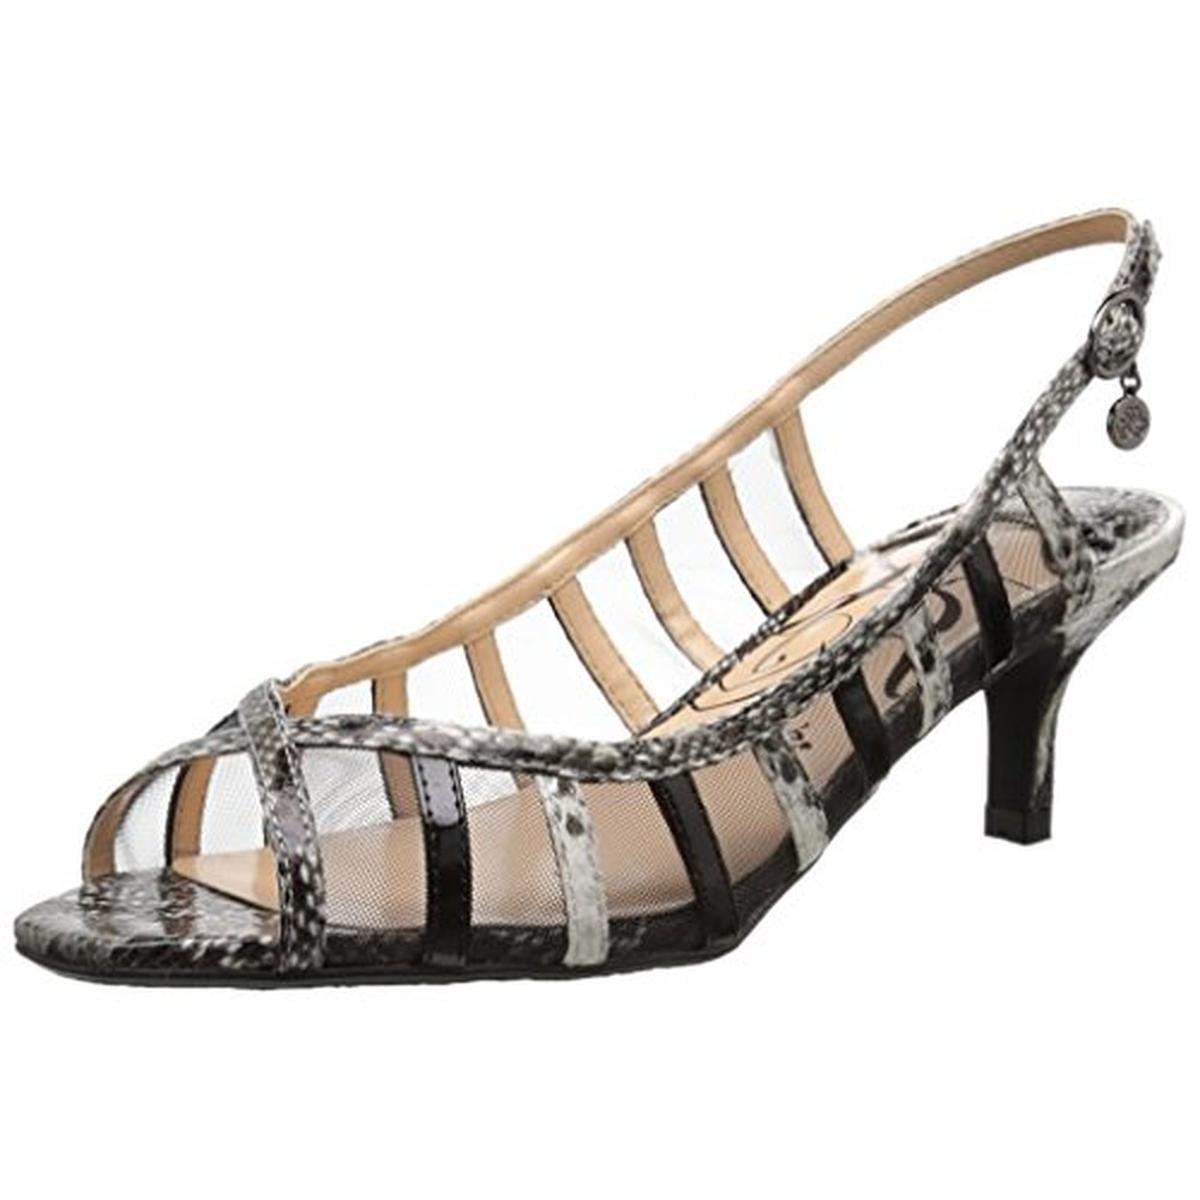 J. Renee Womens Rebeka Open Toe Slingback Heels by J. Renee